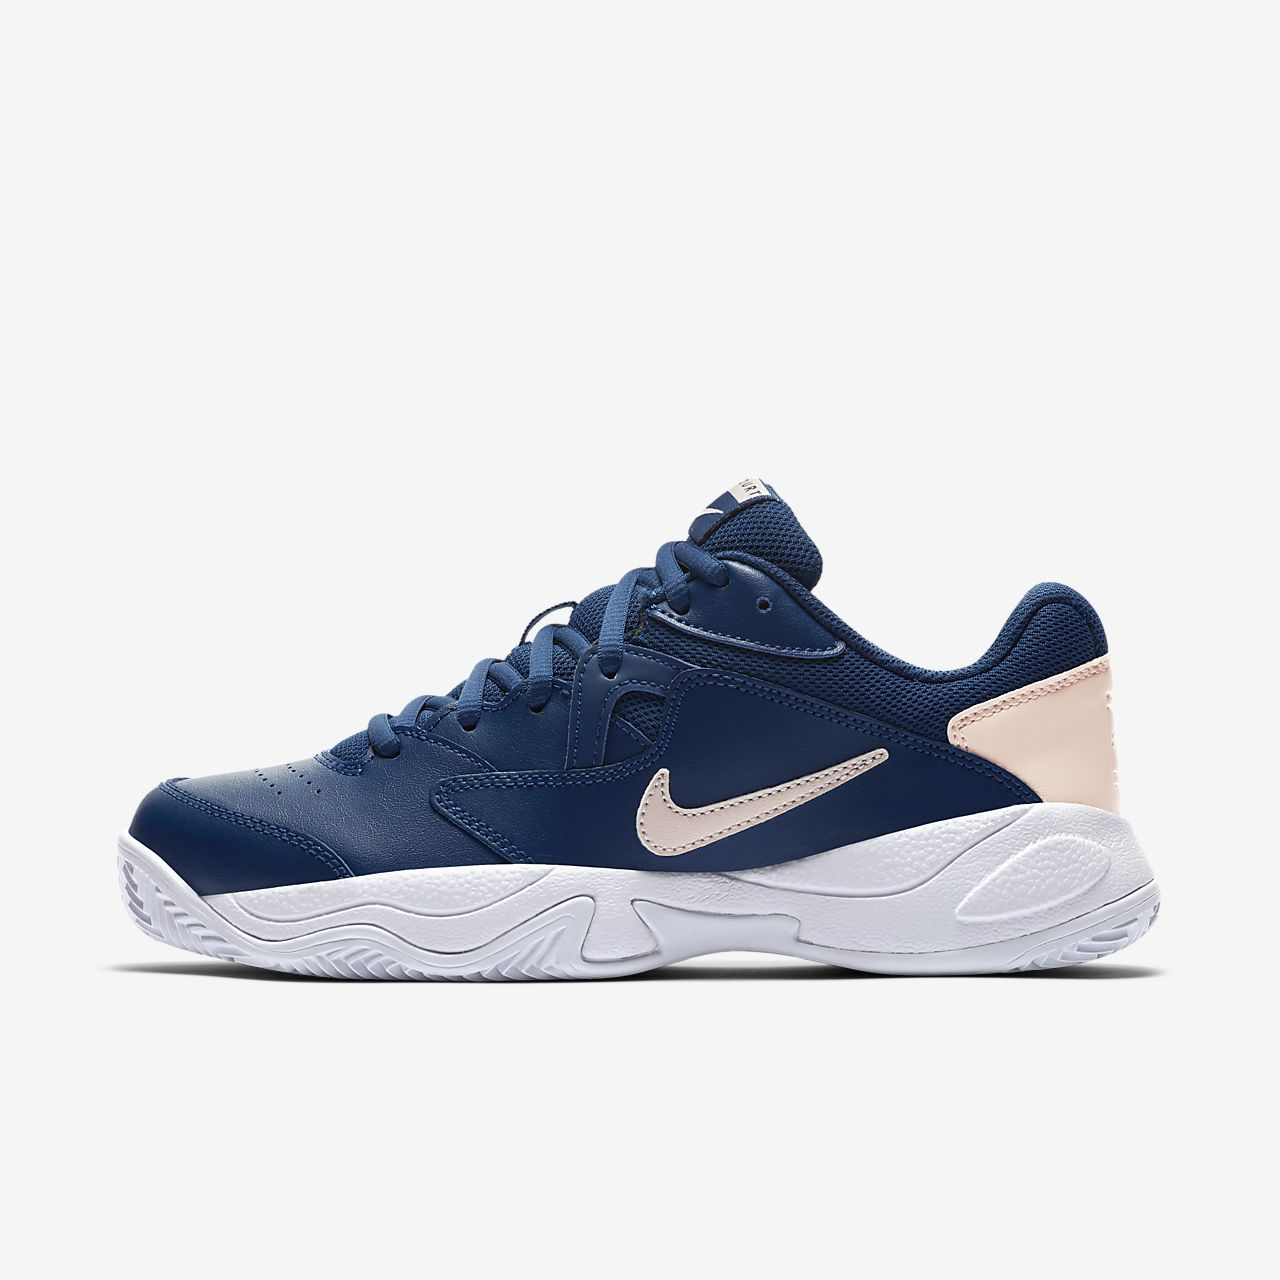 Calzado de tenis para canchas de arcilla para mujer NikeCourt Lite 2